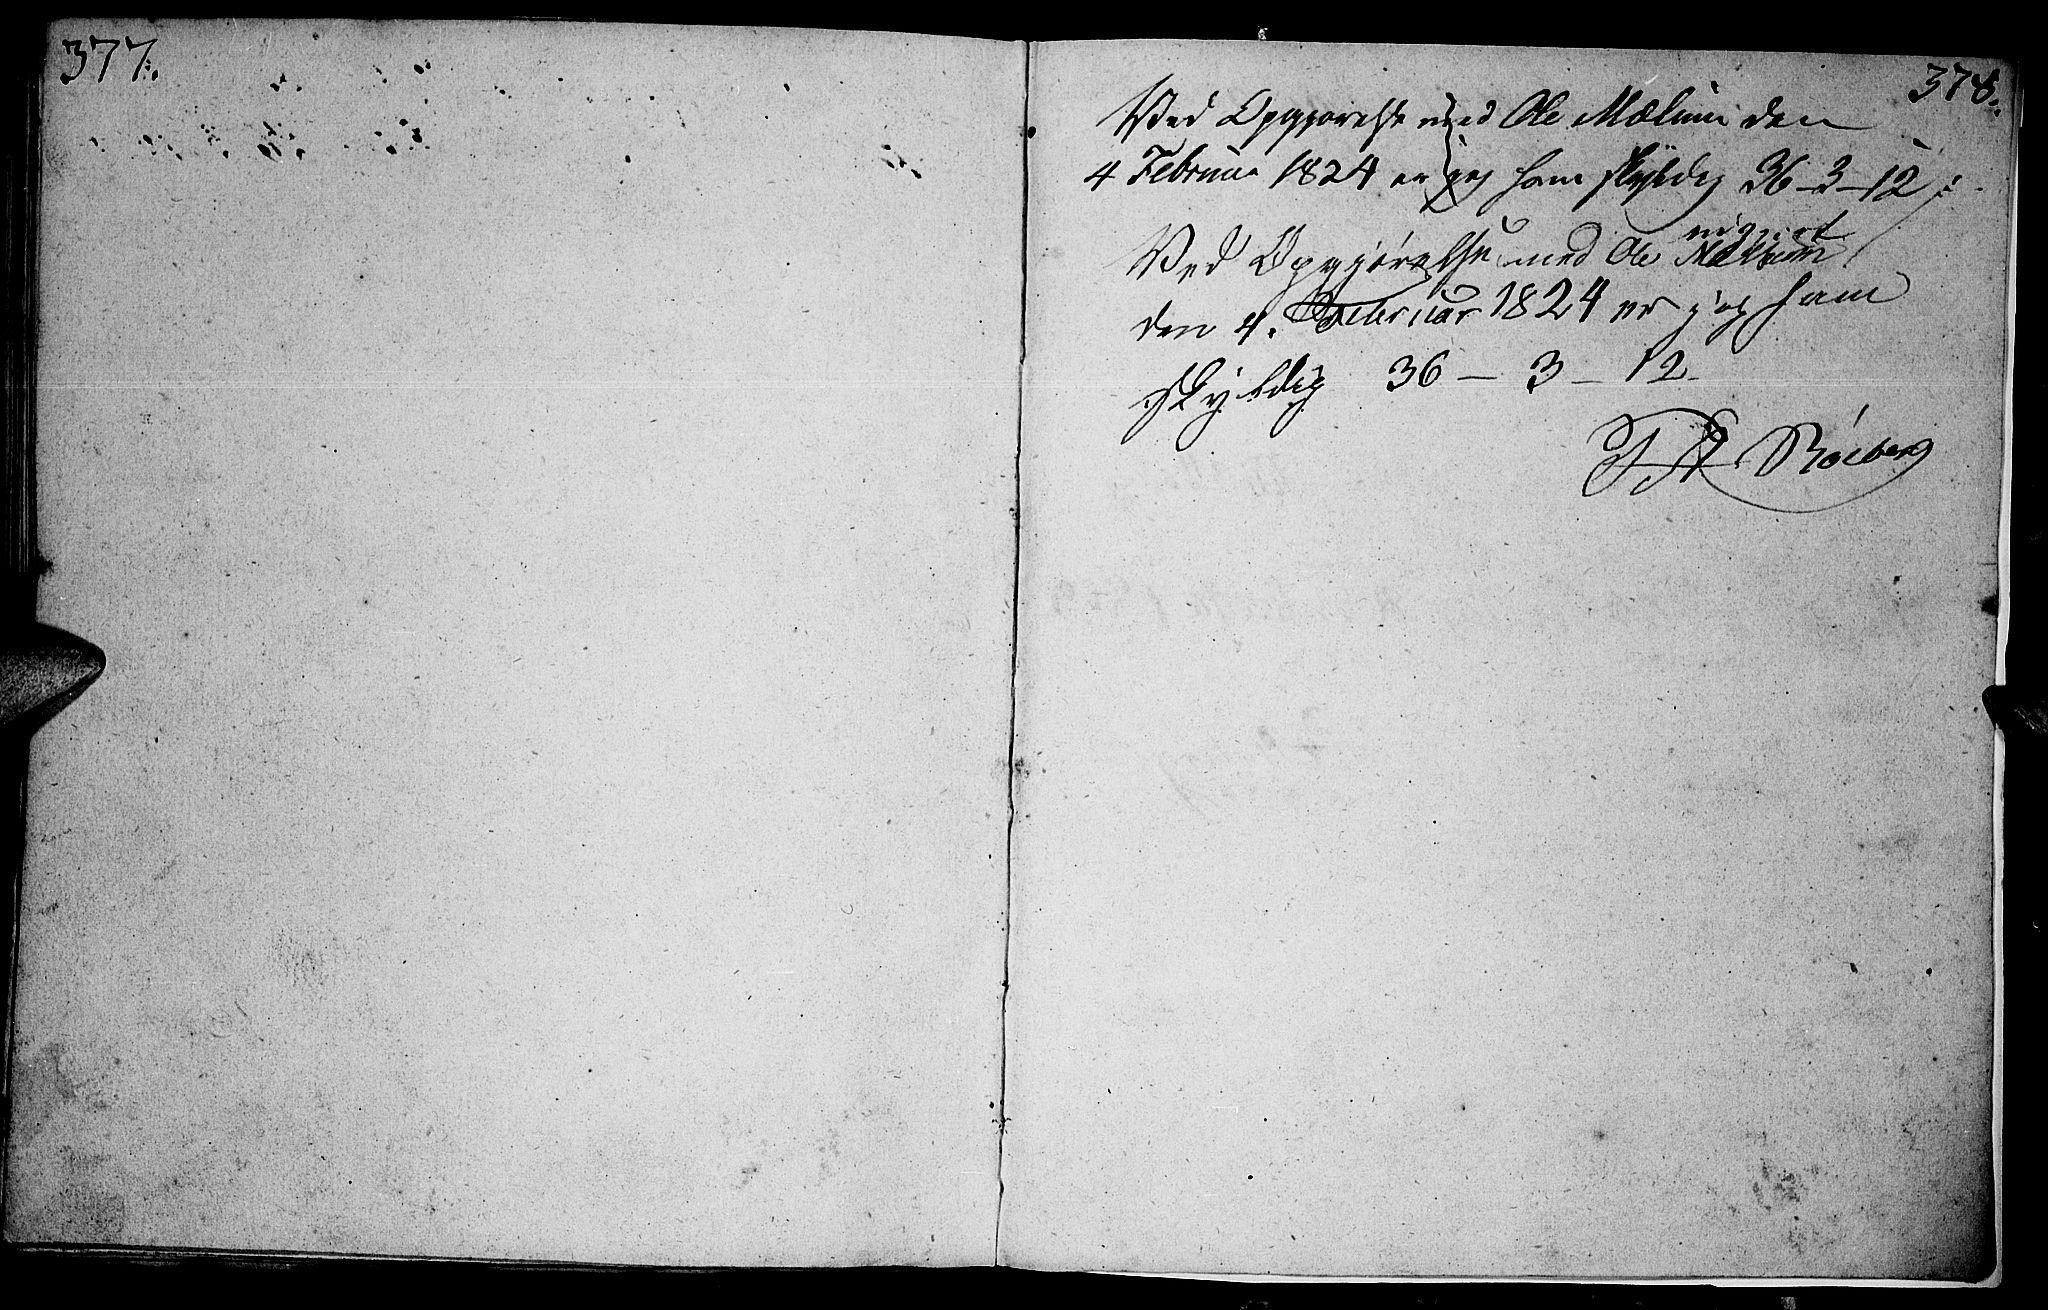 SAH, Vardal prestekontor, H/Ha/Hab/L0003: Klokkerbok nr. 3, 1803-1808, s. 377-378